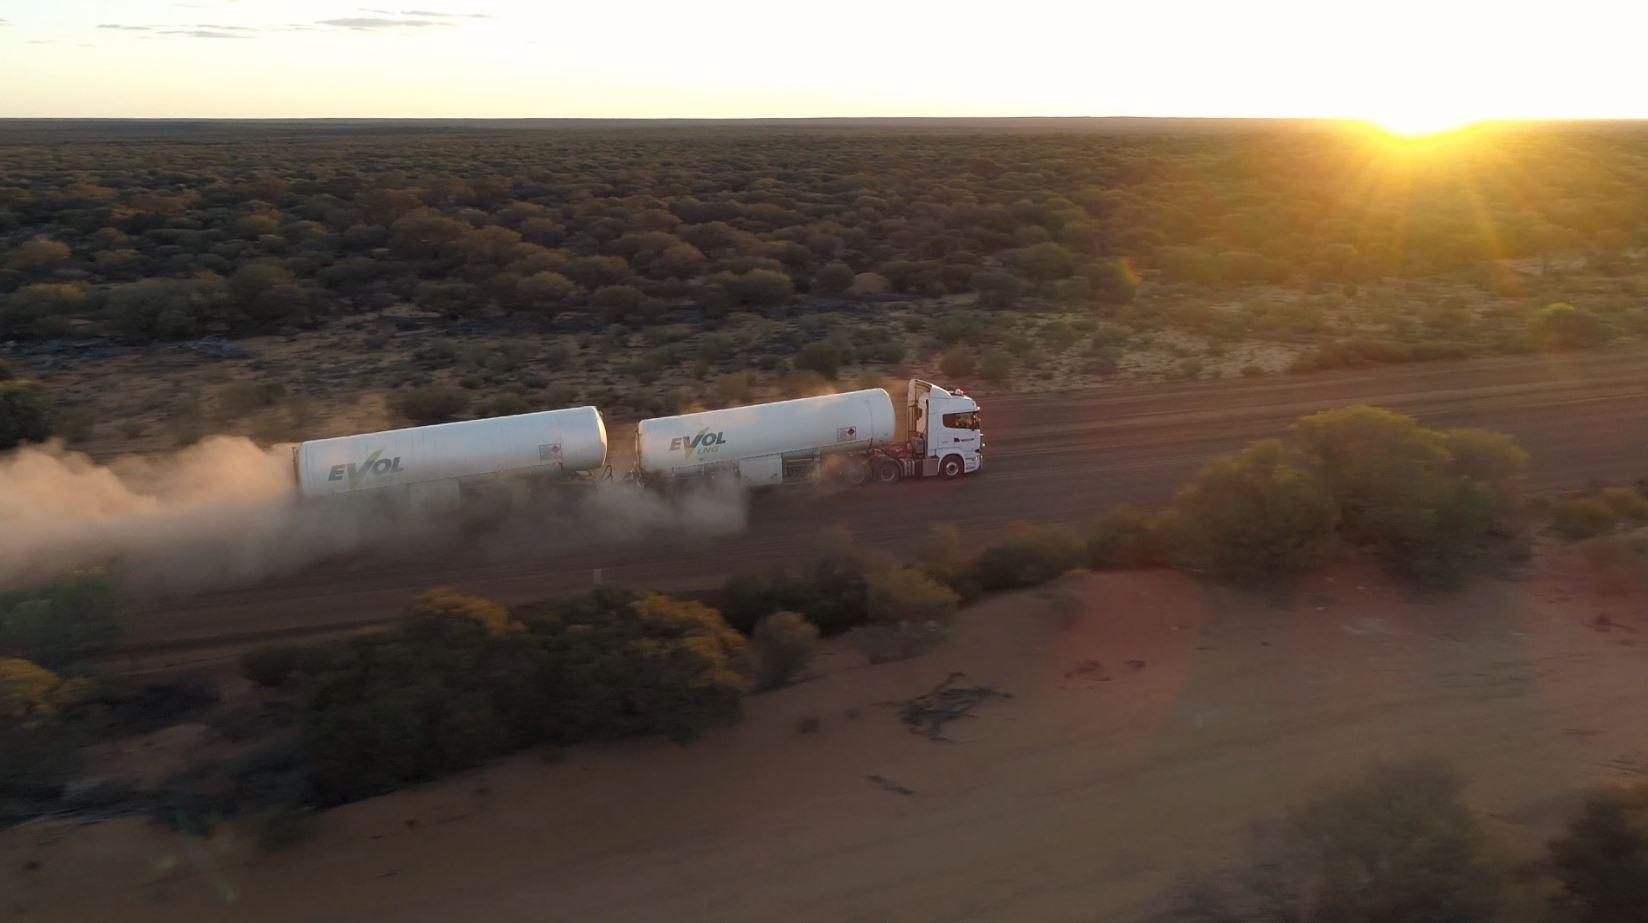 Evol LNG to power Western Australia gold mine